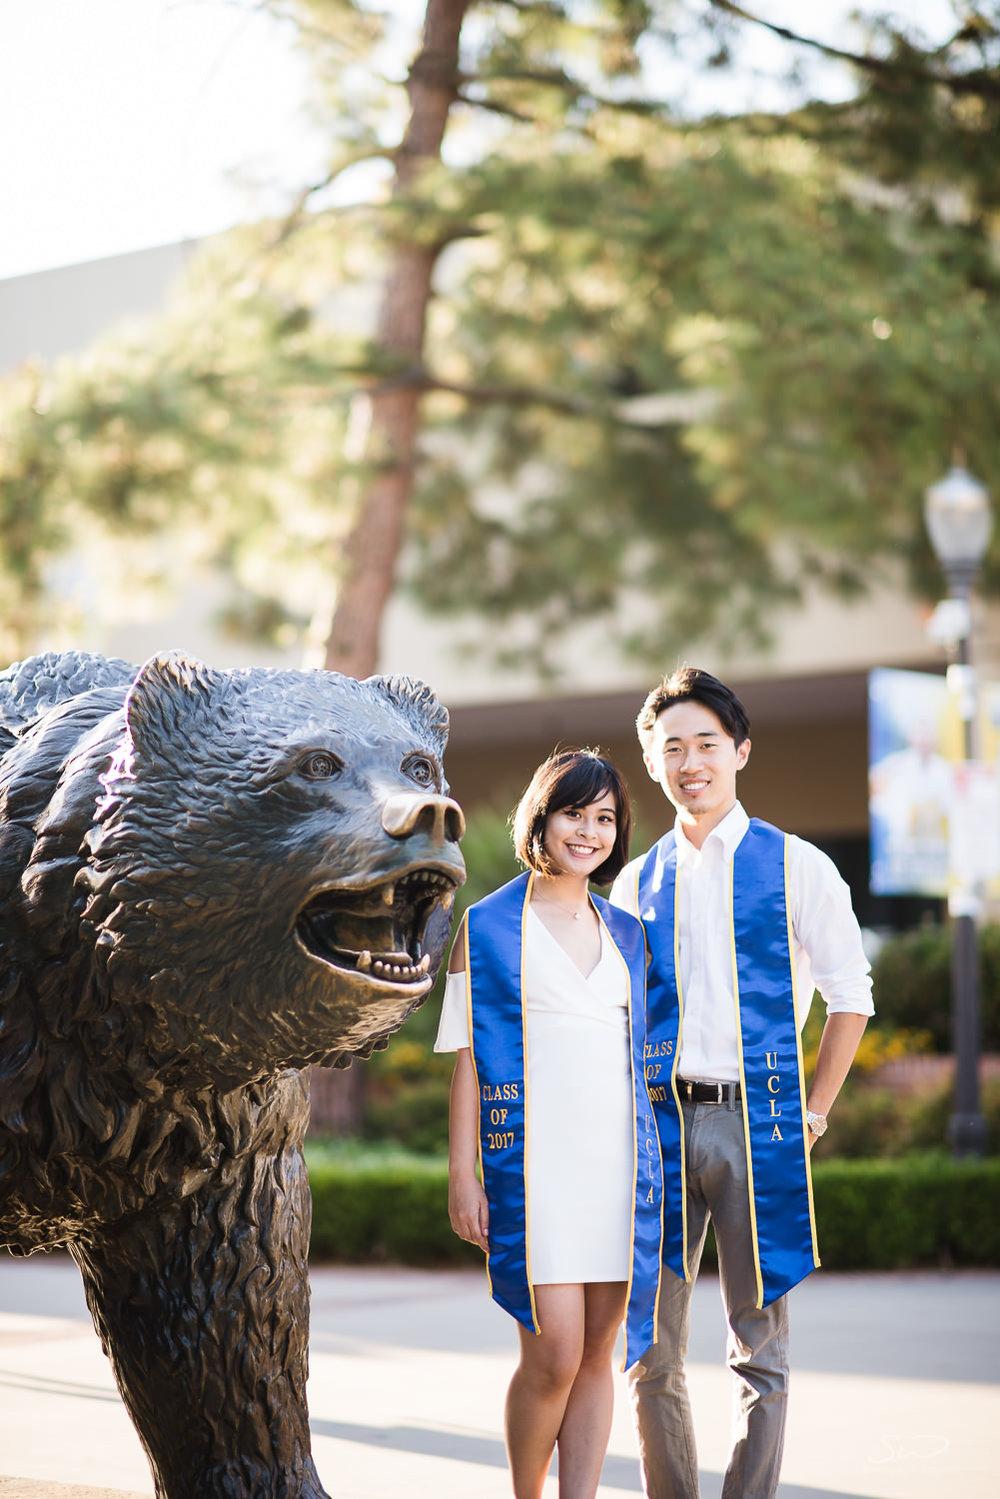 Copy of Copy of college senior couple wearing 2017 sashes | Stanley Wu Photography | Los Angeles | Graduation Portraits | UCLA, USC, LMU, Pepperdine, CSULA, CSUN, CSULB, UCI, UCSD